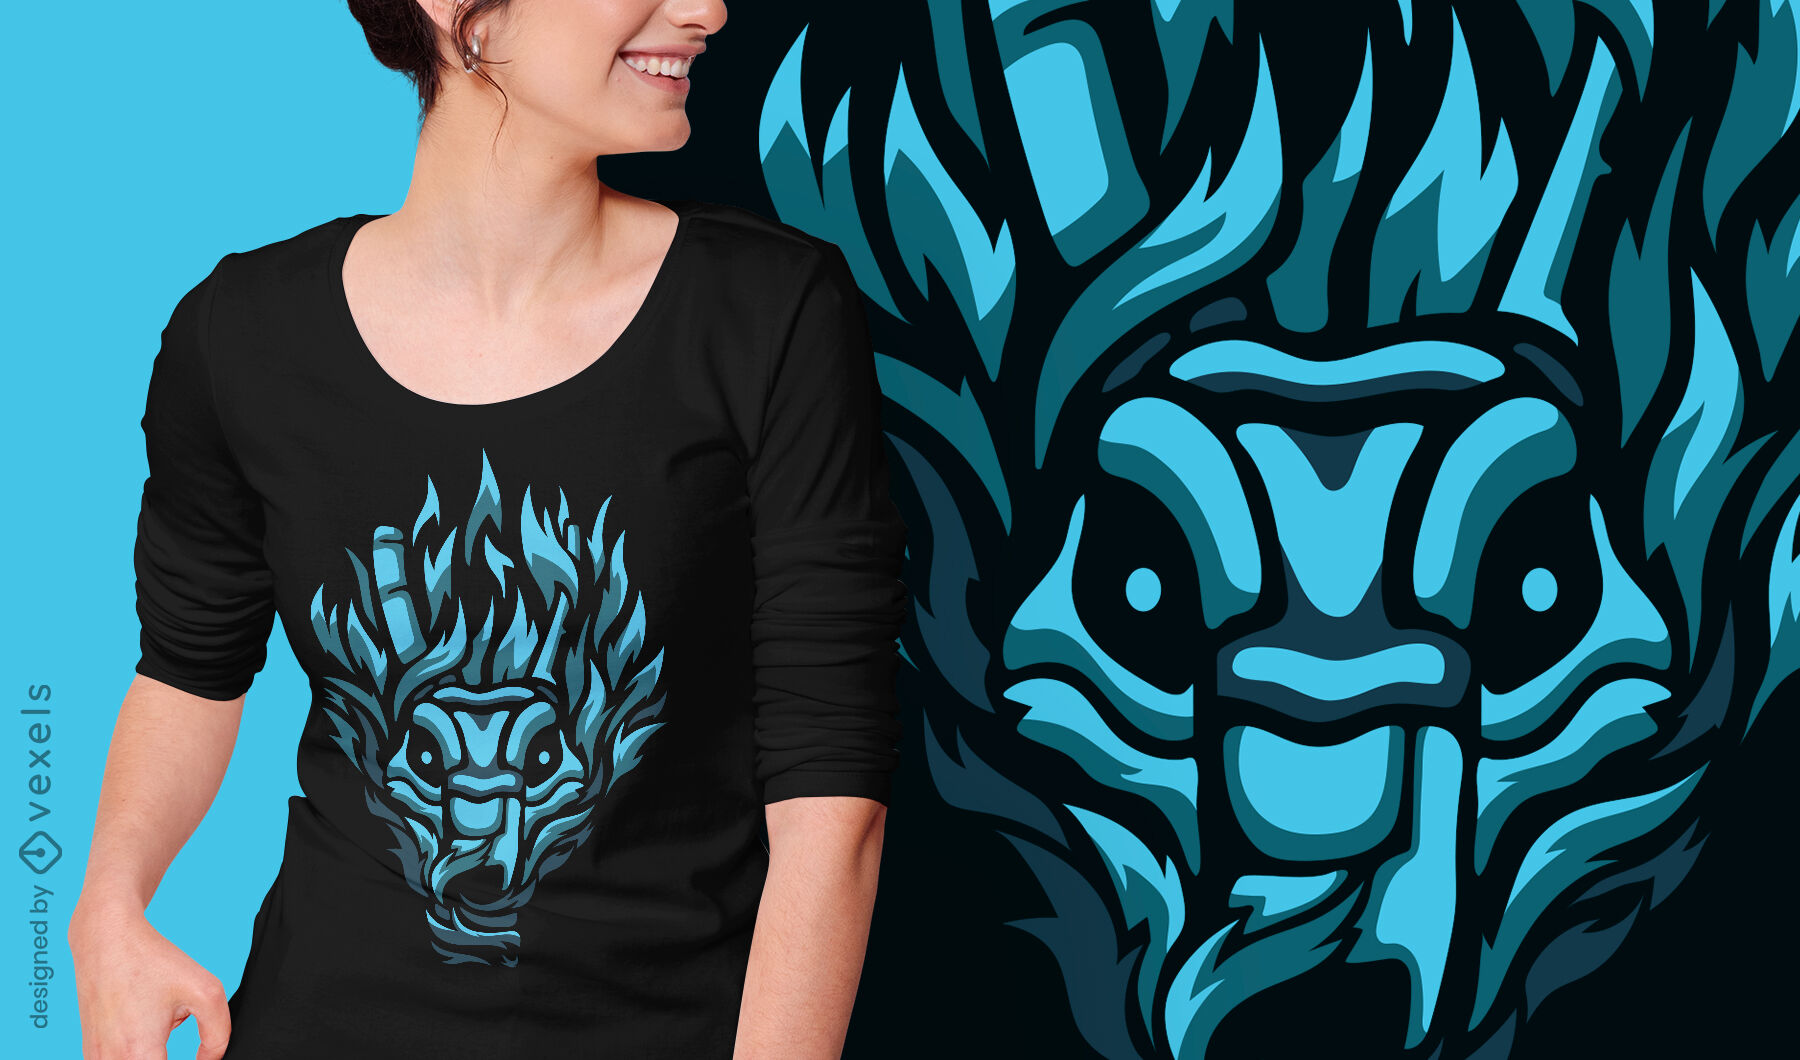 Diseño de camiseta con cara de demonio criatura oscura.